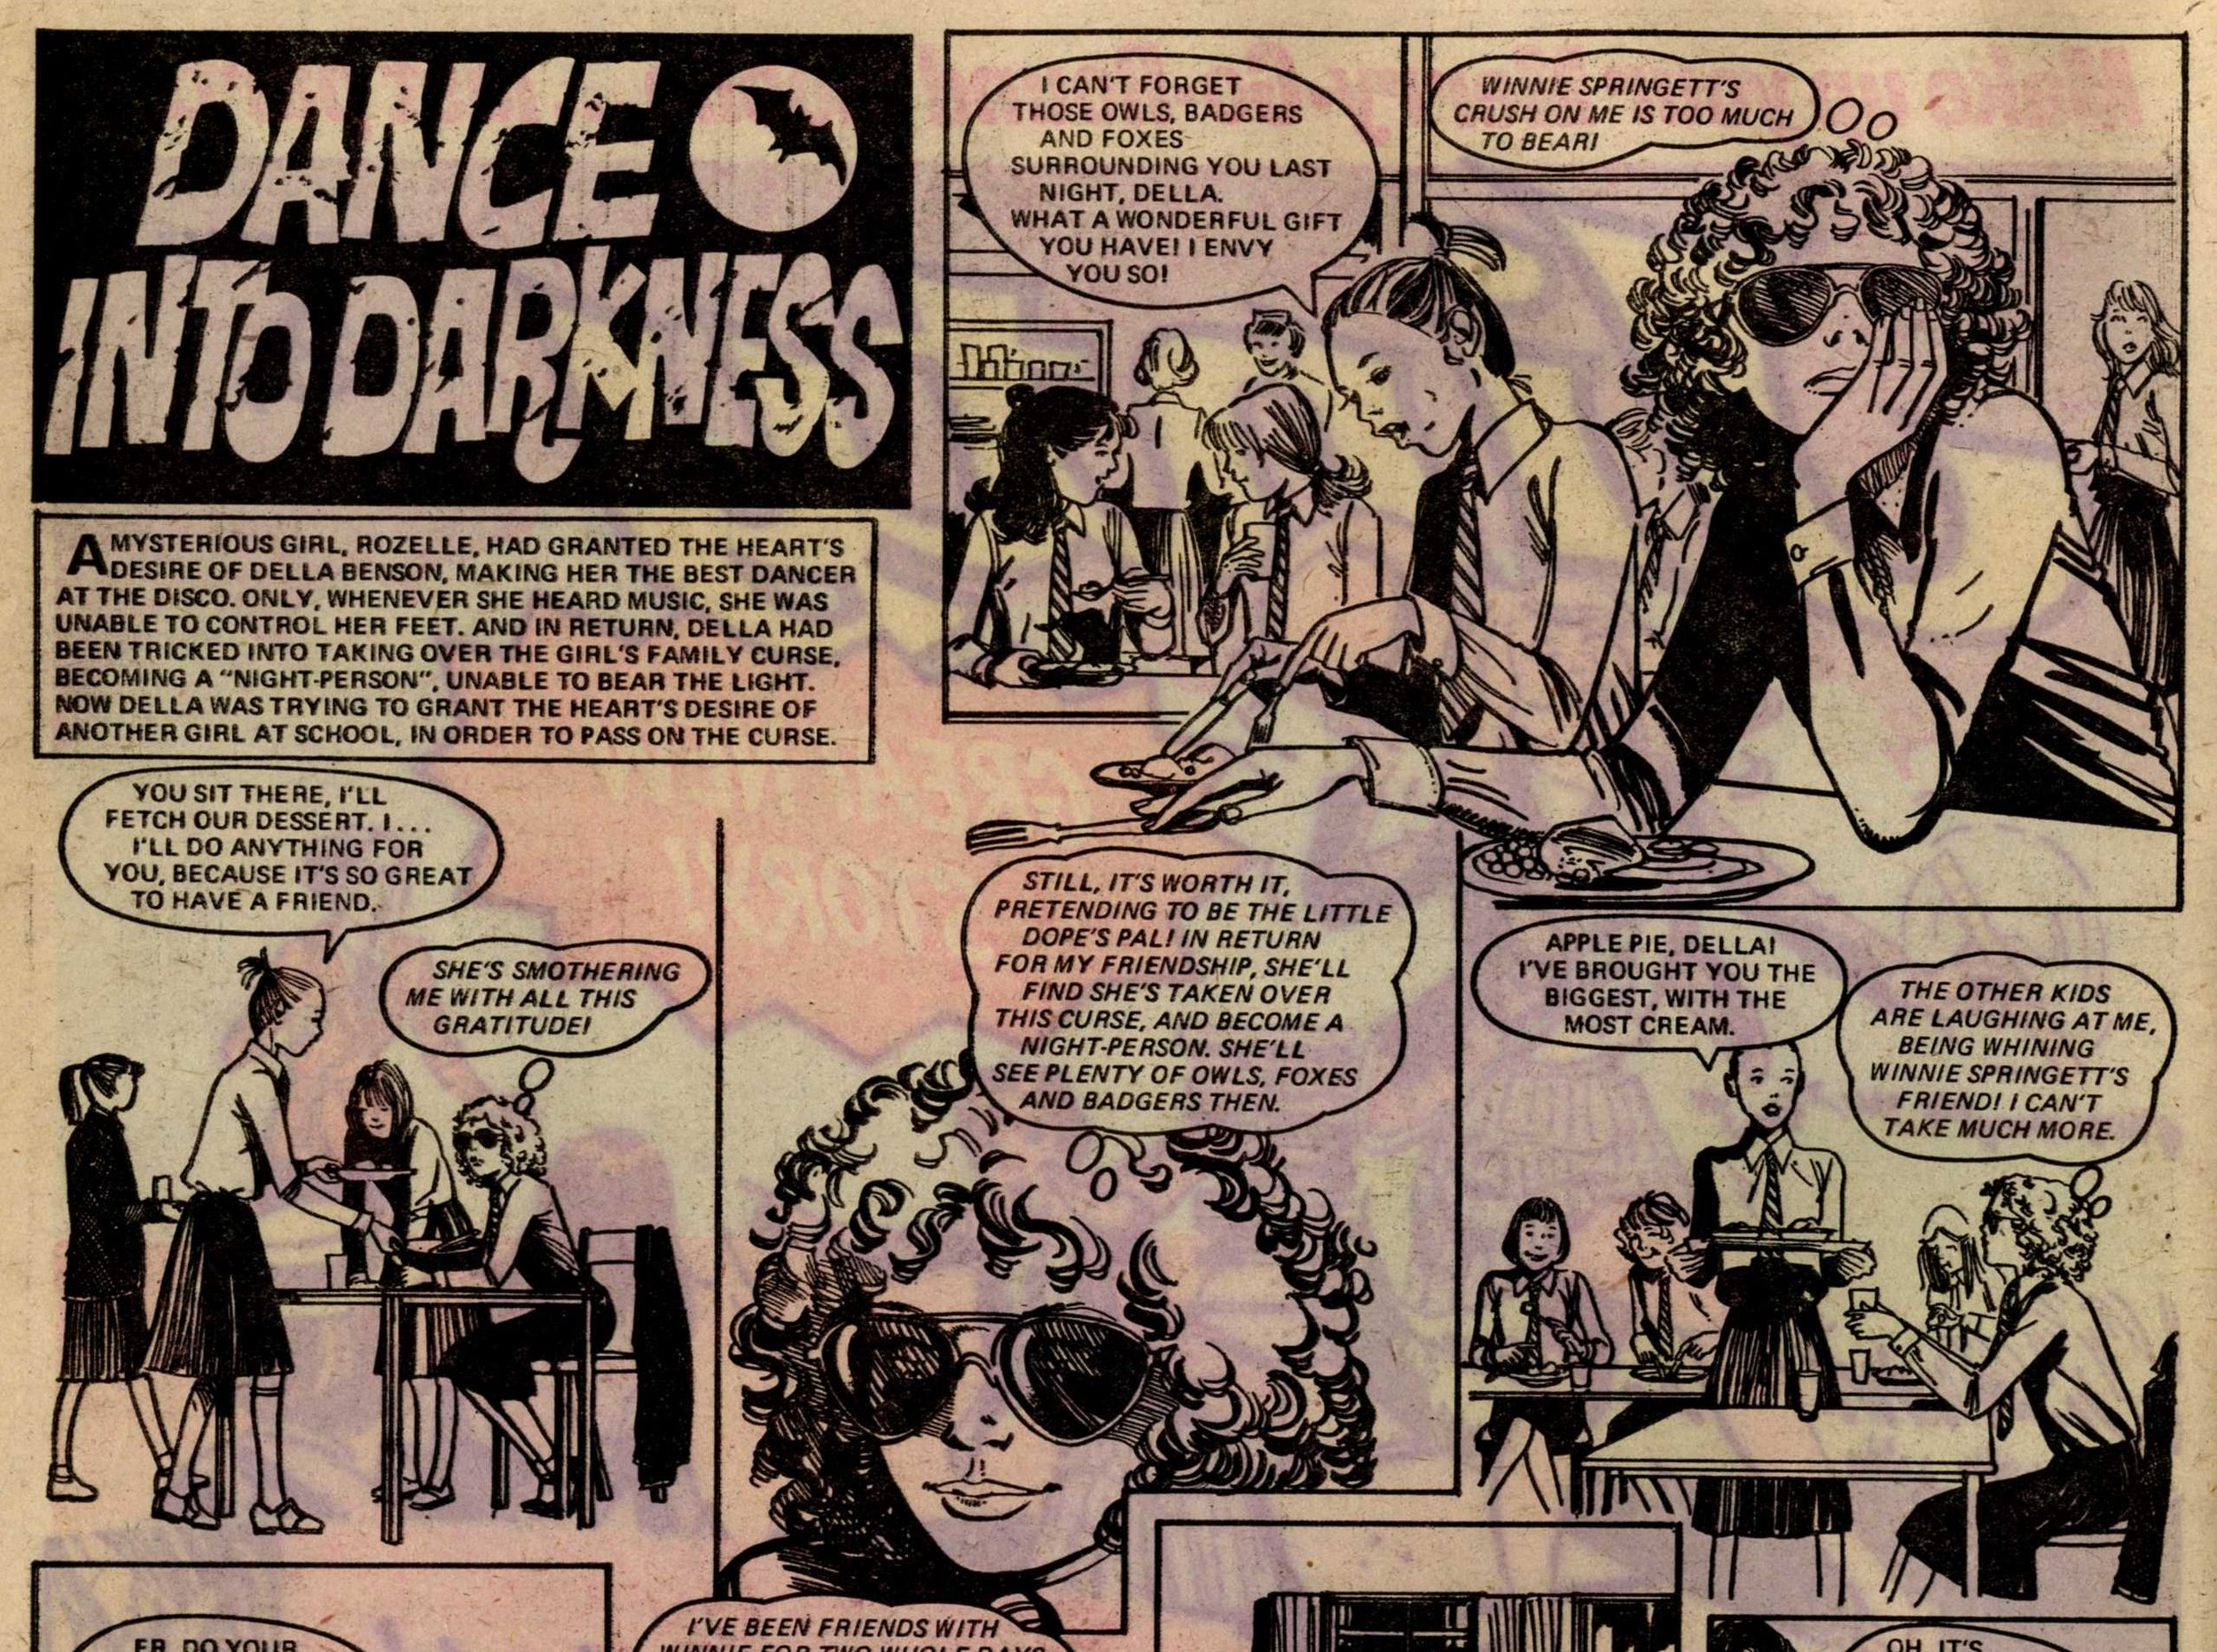 Dance into Darkness: creators unknown